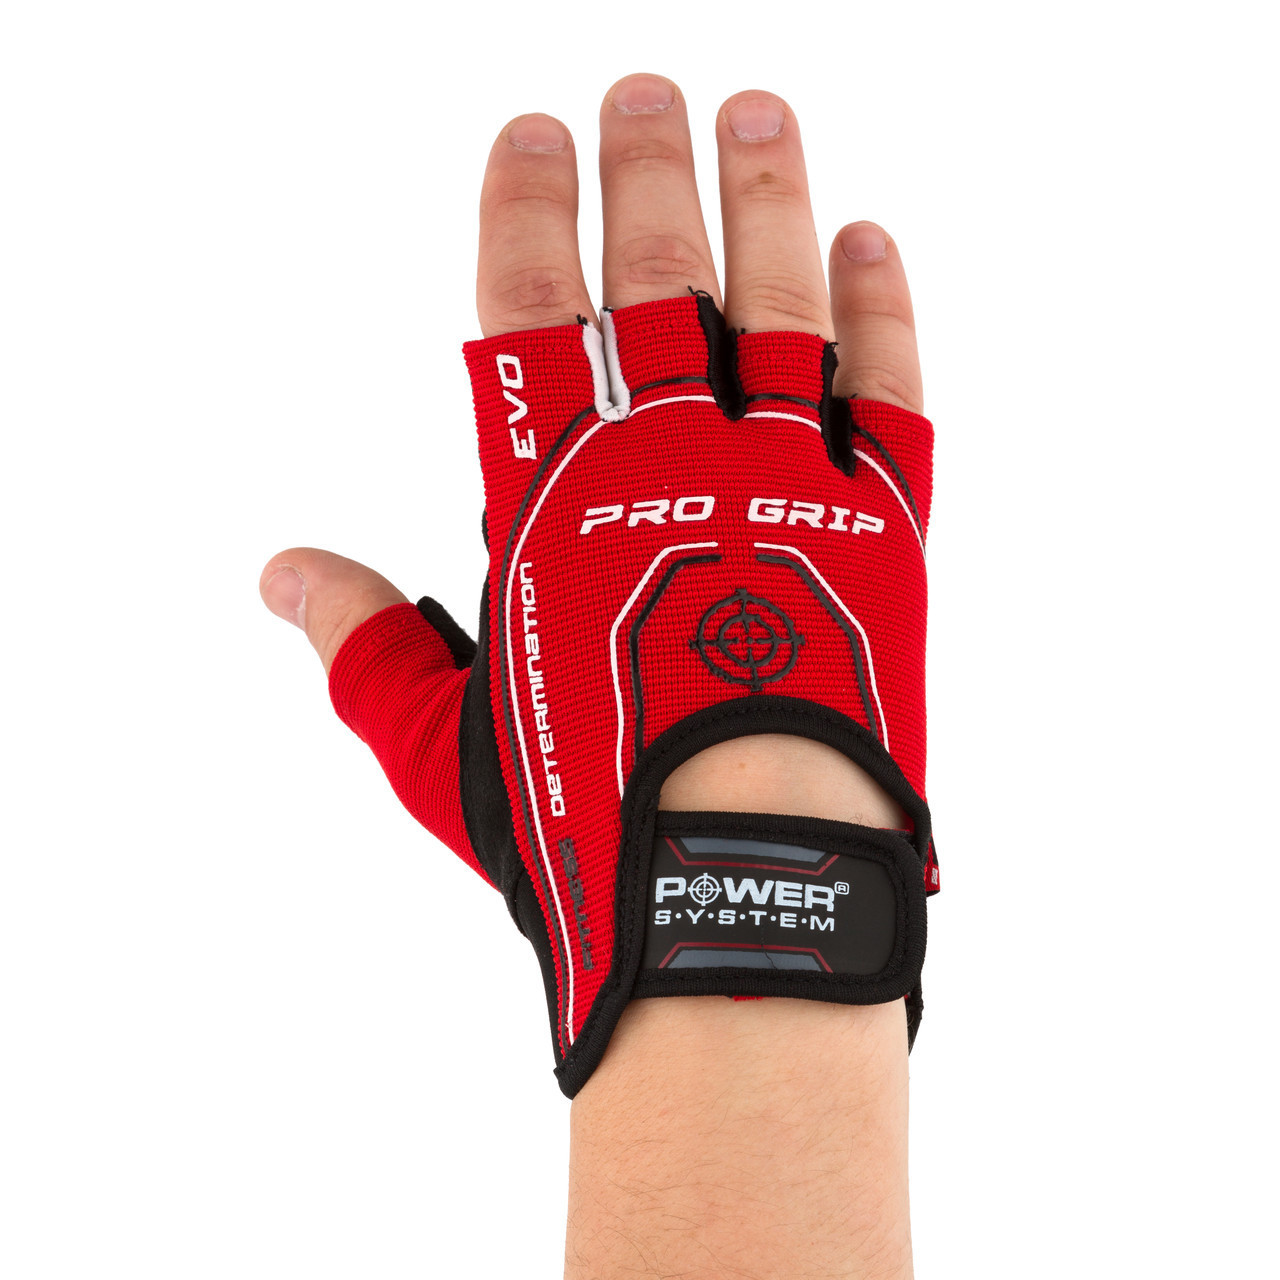 Перчатки для фитнеса и тяжелой атлетики Power System Pro Grip EVO PS-2250E XS Red